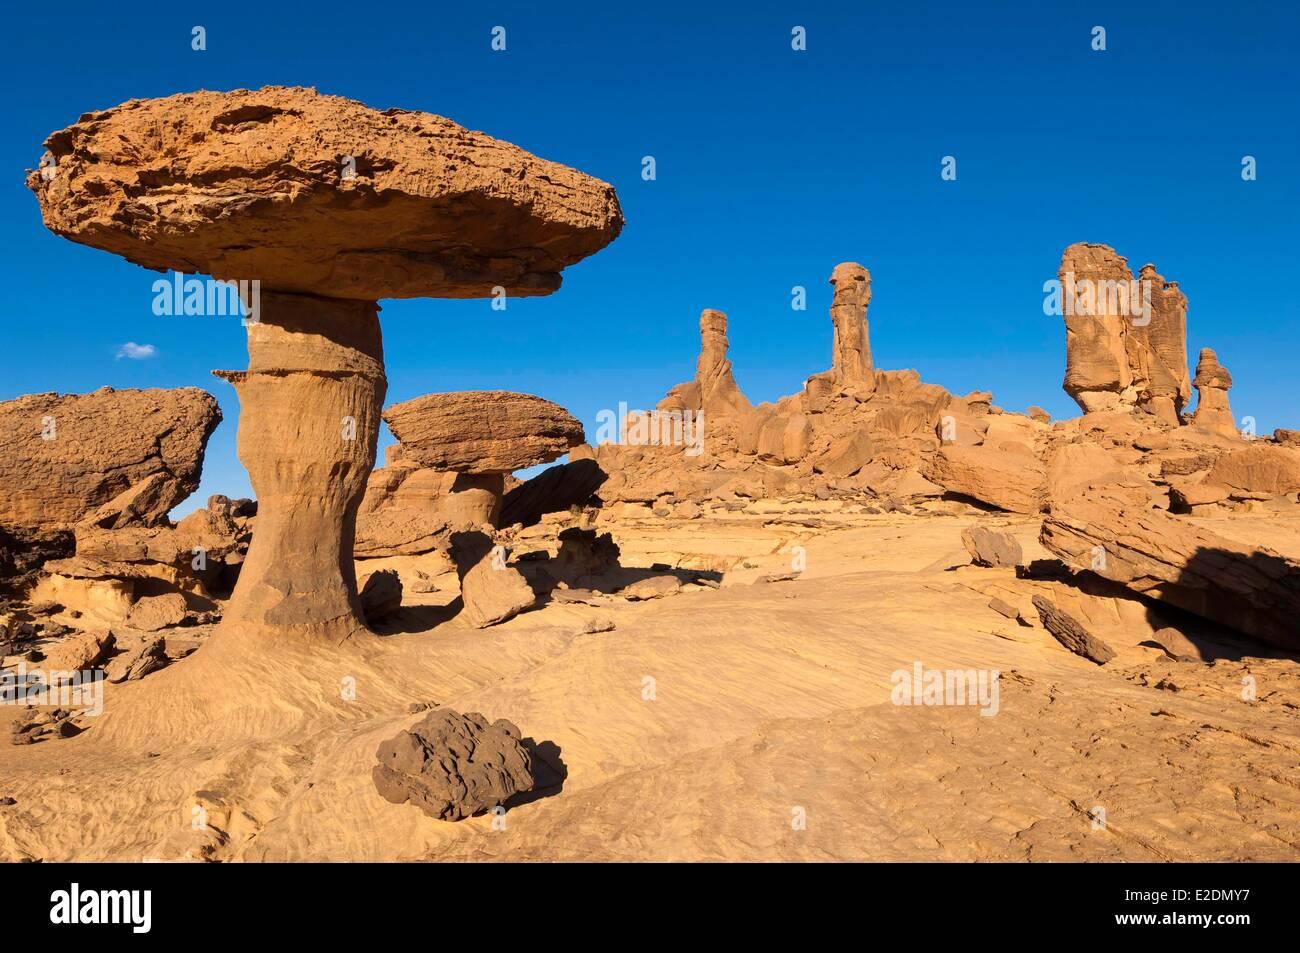 Chad Southern Sahara desert Ennedi massif Deli mushrooms - Stock Image